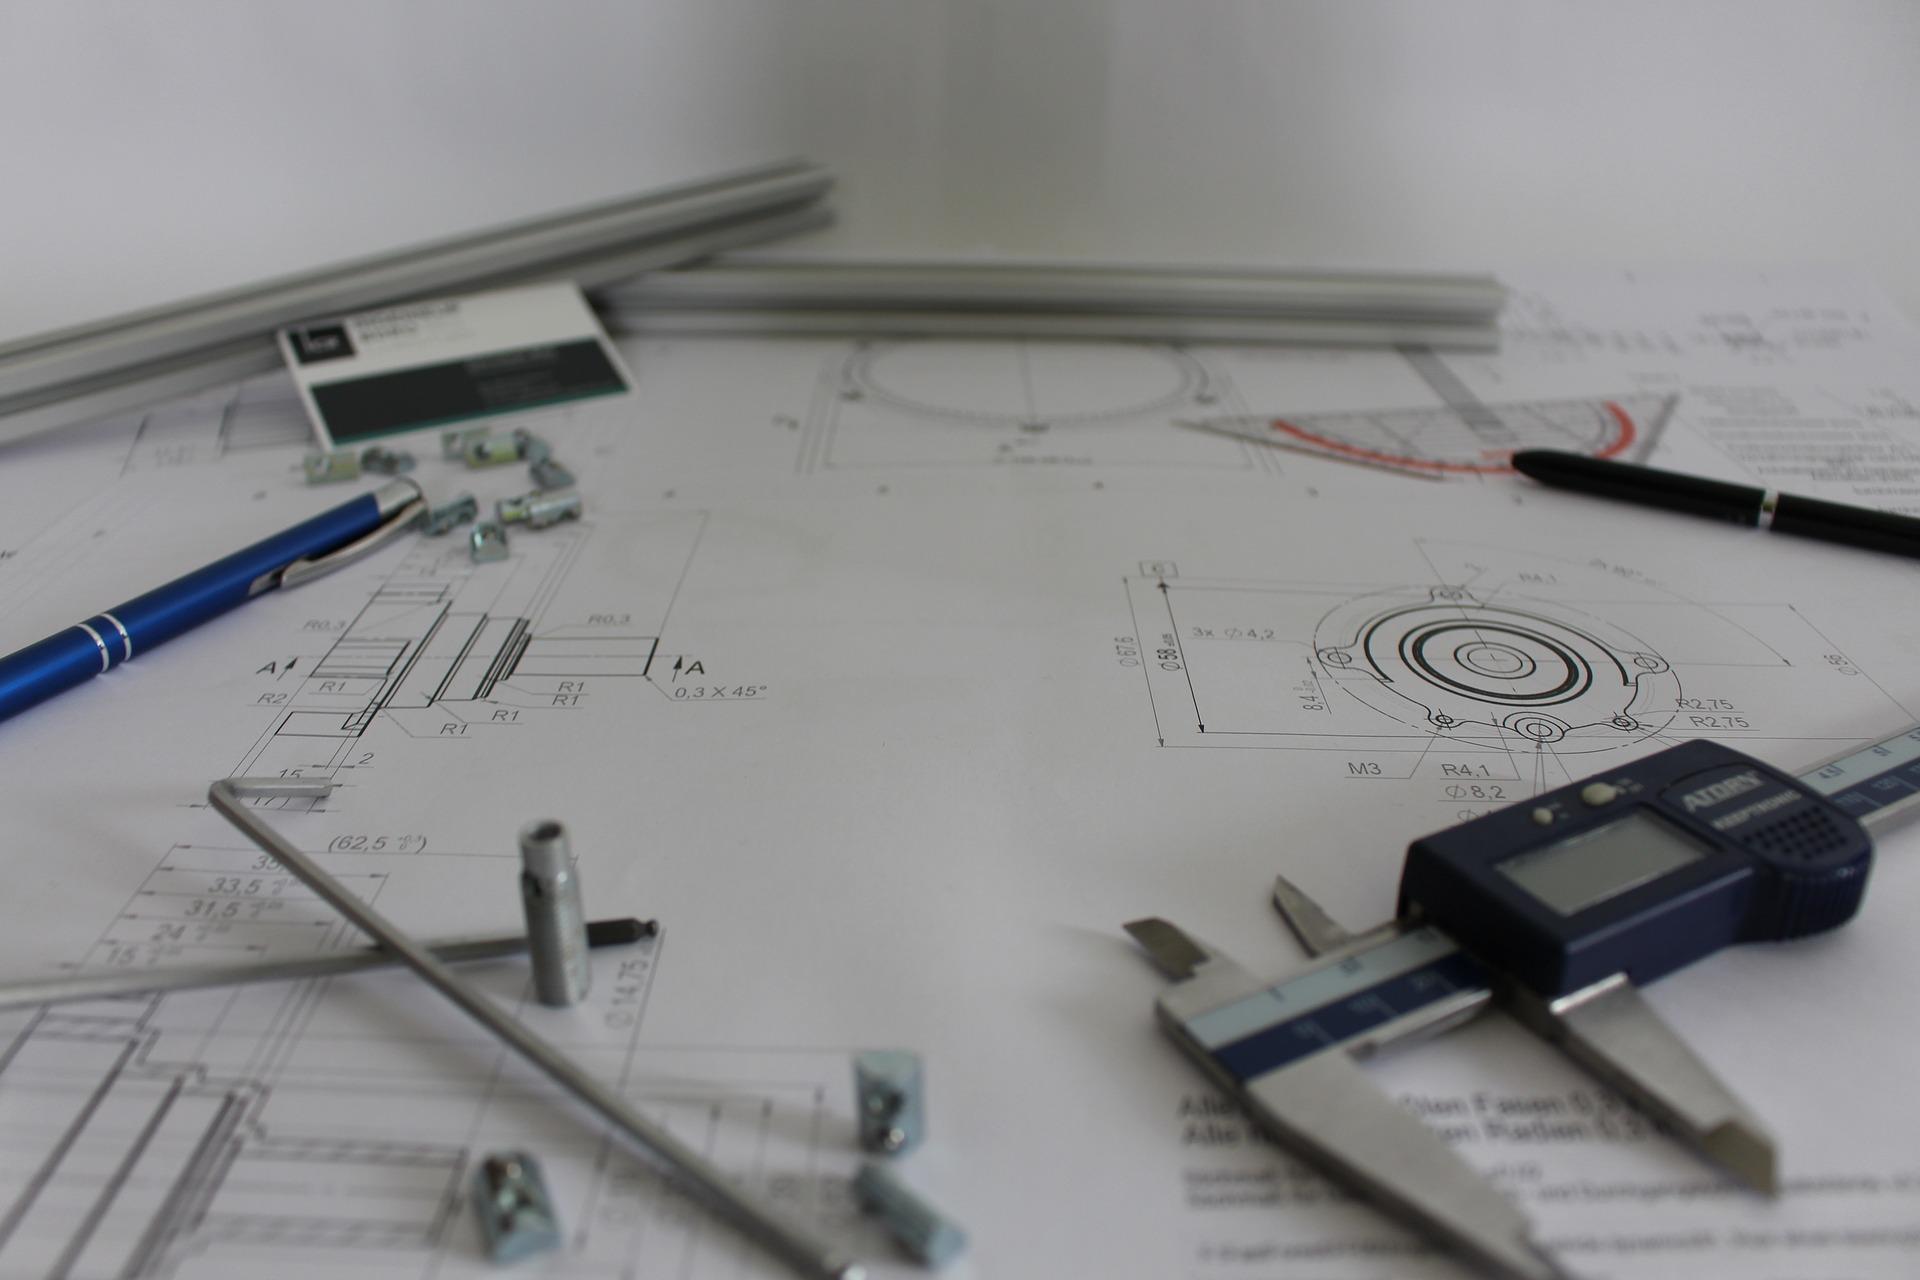 Cardboard Helicopter Product Design Cleveland Ohio  Product Development Engineering website image.jpg